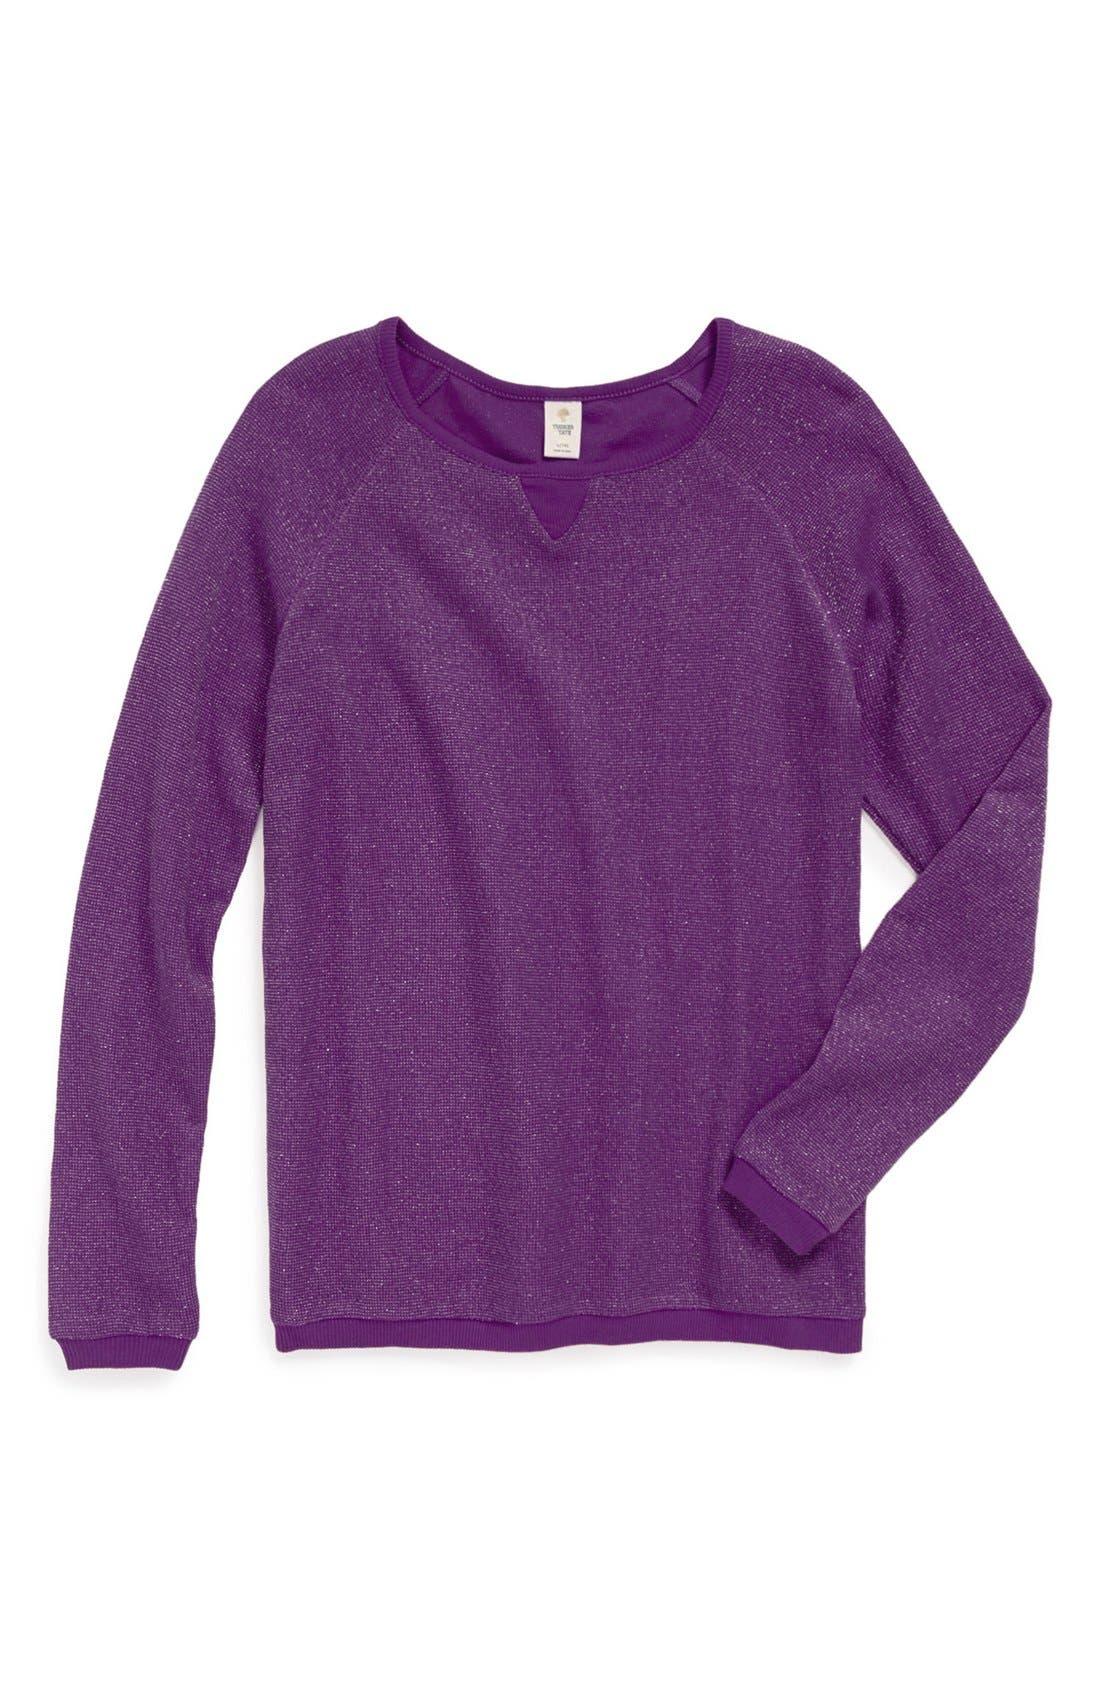 Alternate Image 1 Selected - Tucker + Tate 'Dakota' Thermal Sweatshirt (Big Girls)